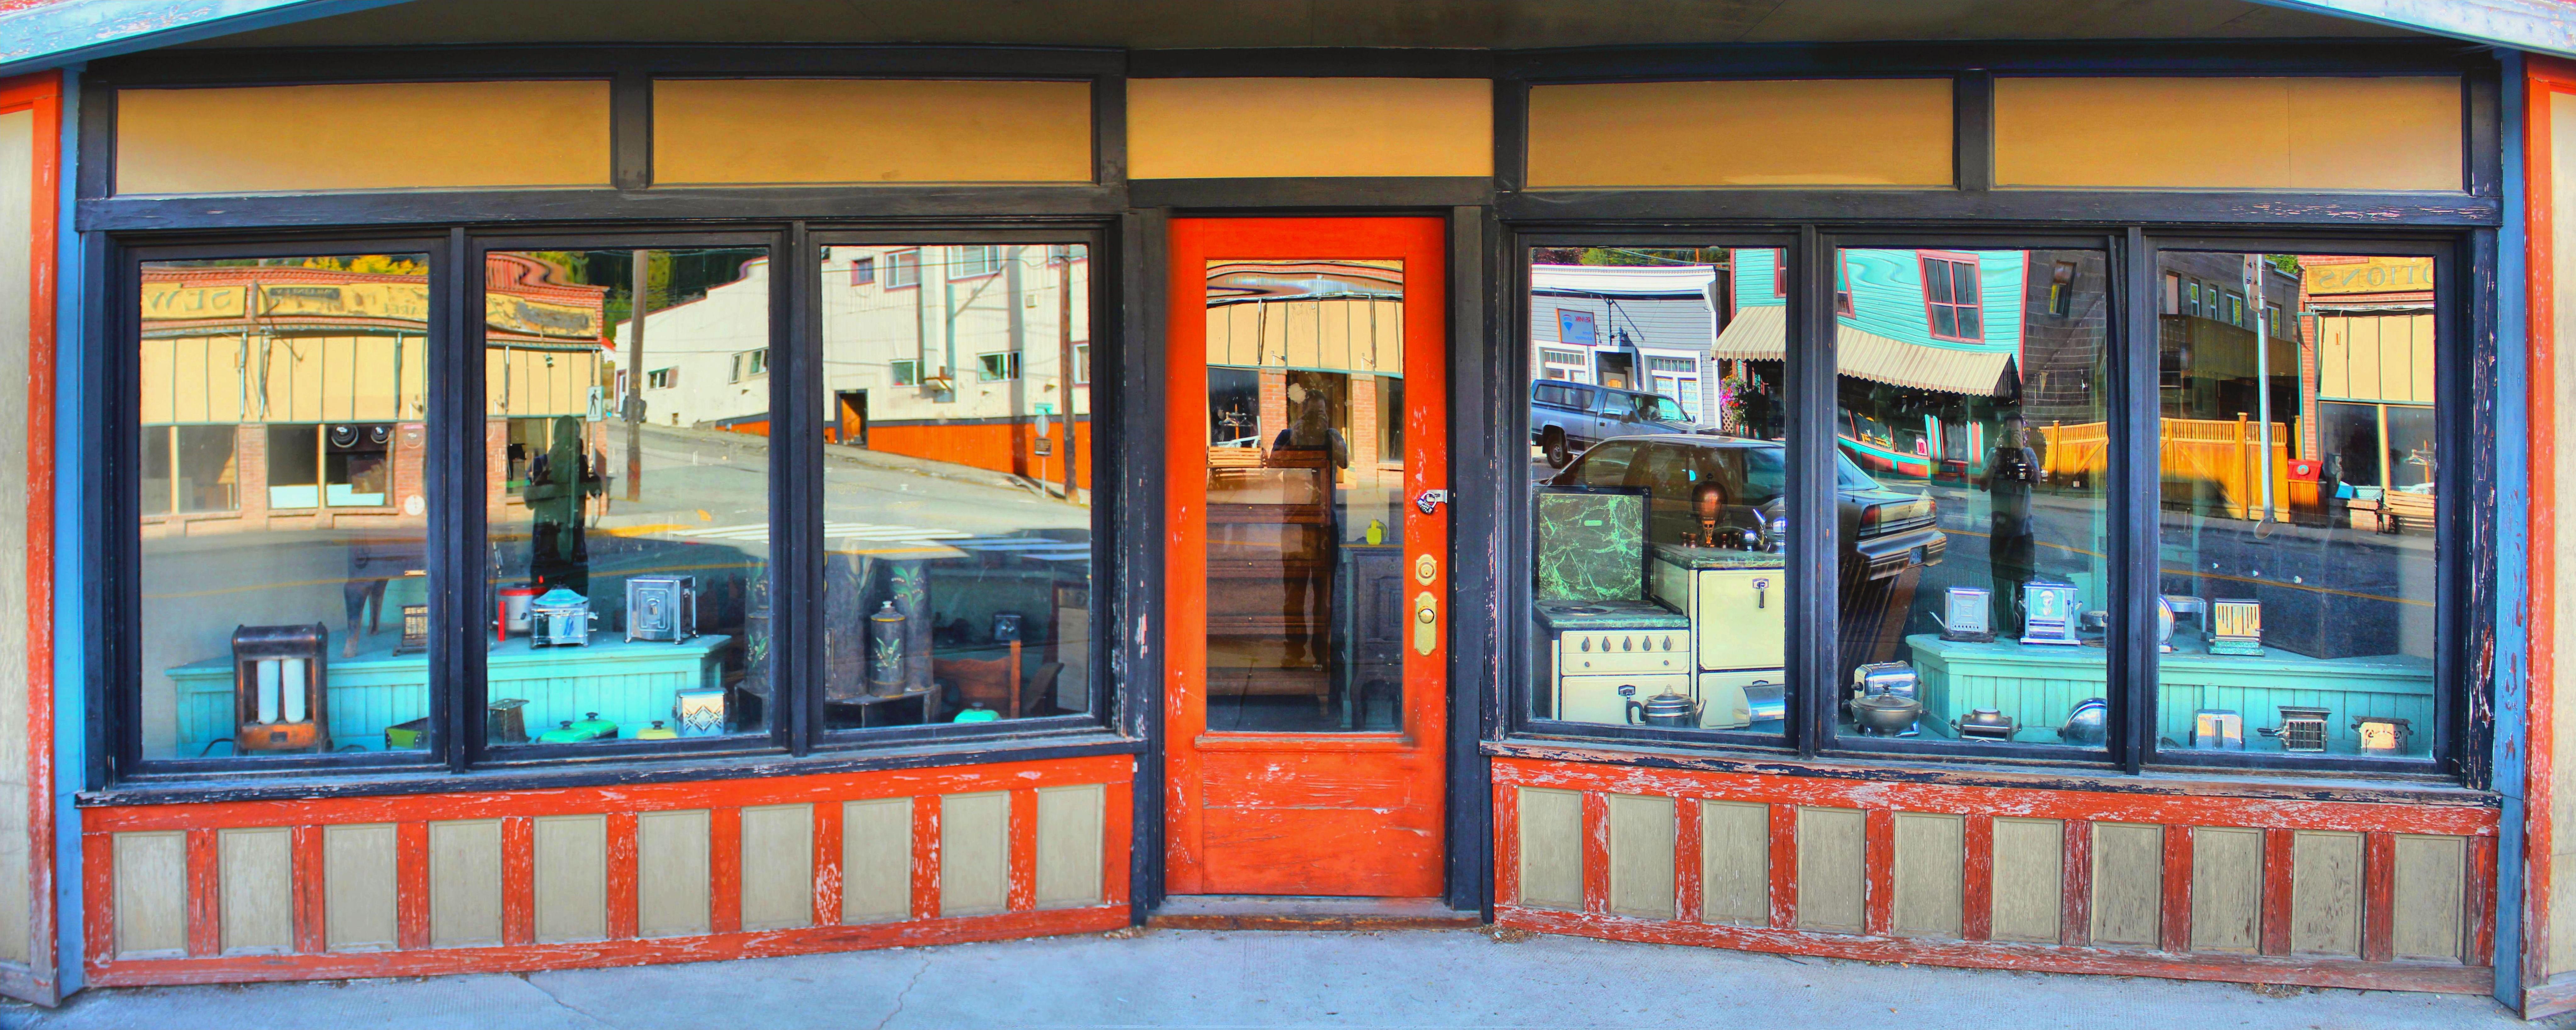 vintage window old panorama panoramic facade door interior design canada storefront britishcolumbia bc kootenays greenwood & Free Images : vintage window old panorama panoramic facade ...